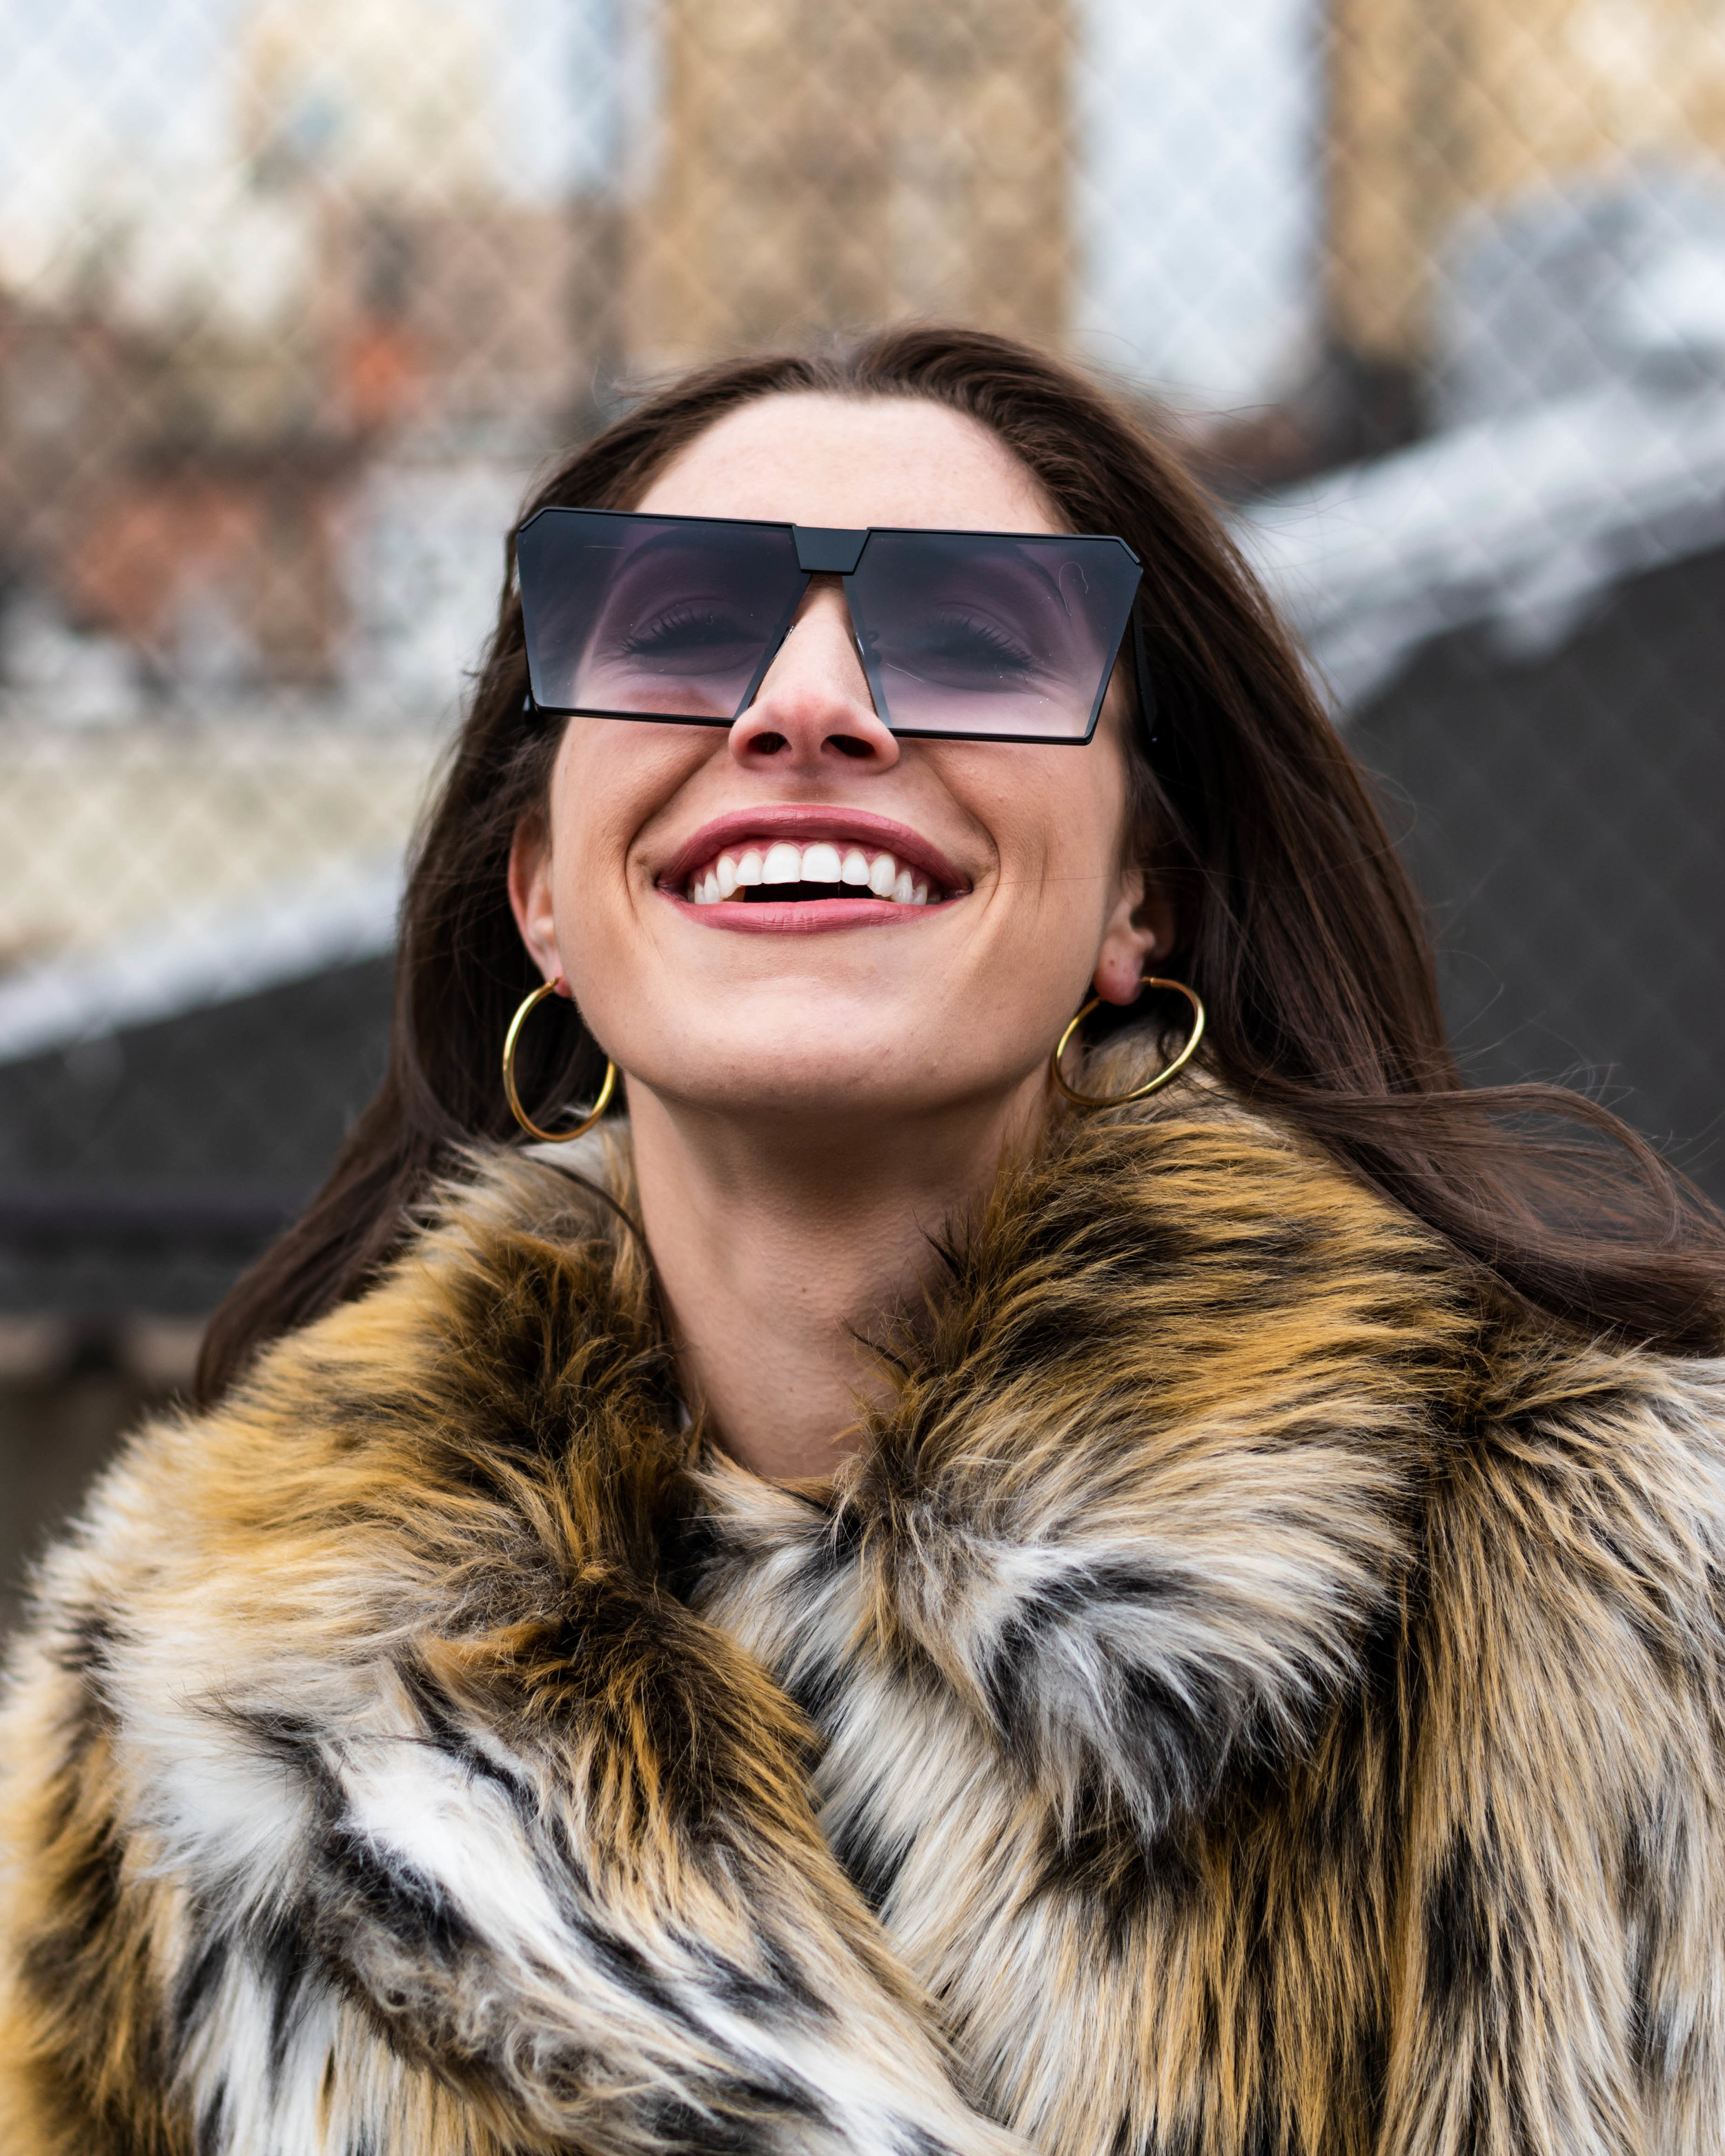 ROYAL   GIRL  Classic Square Women Sunglasses